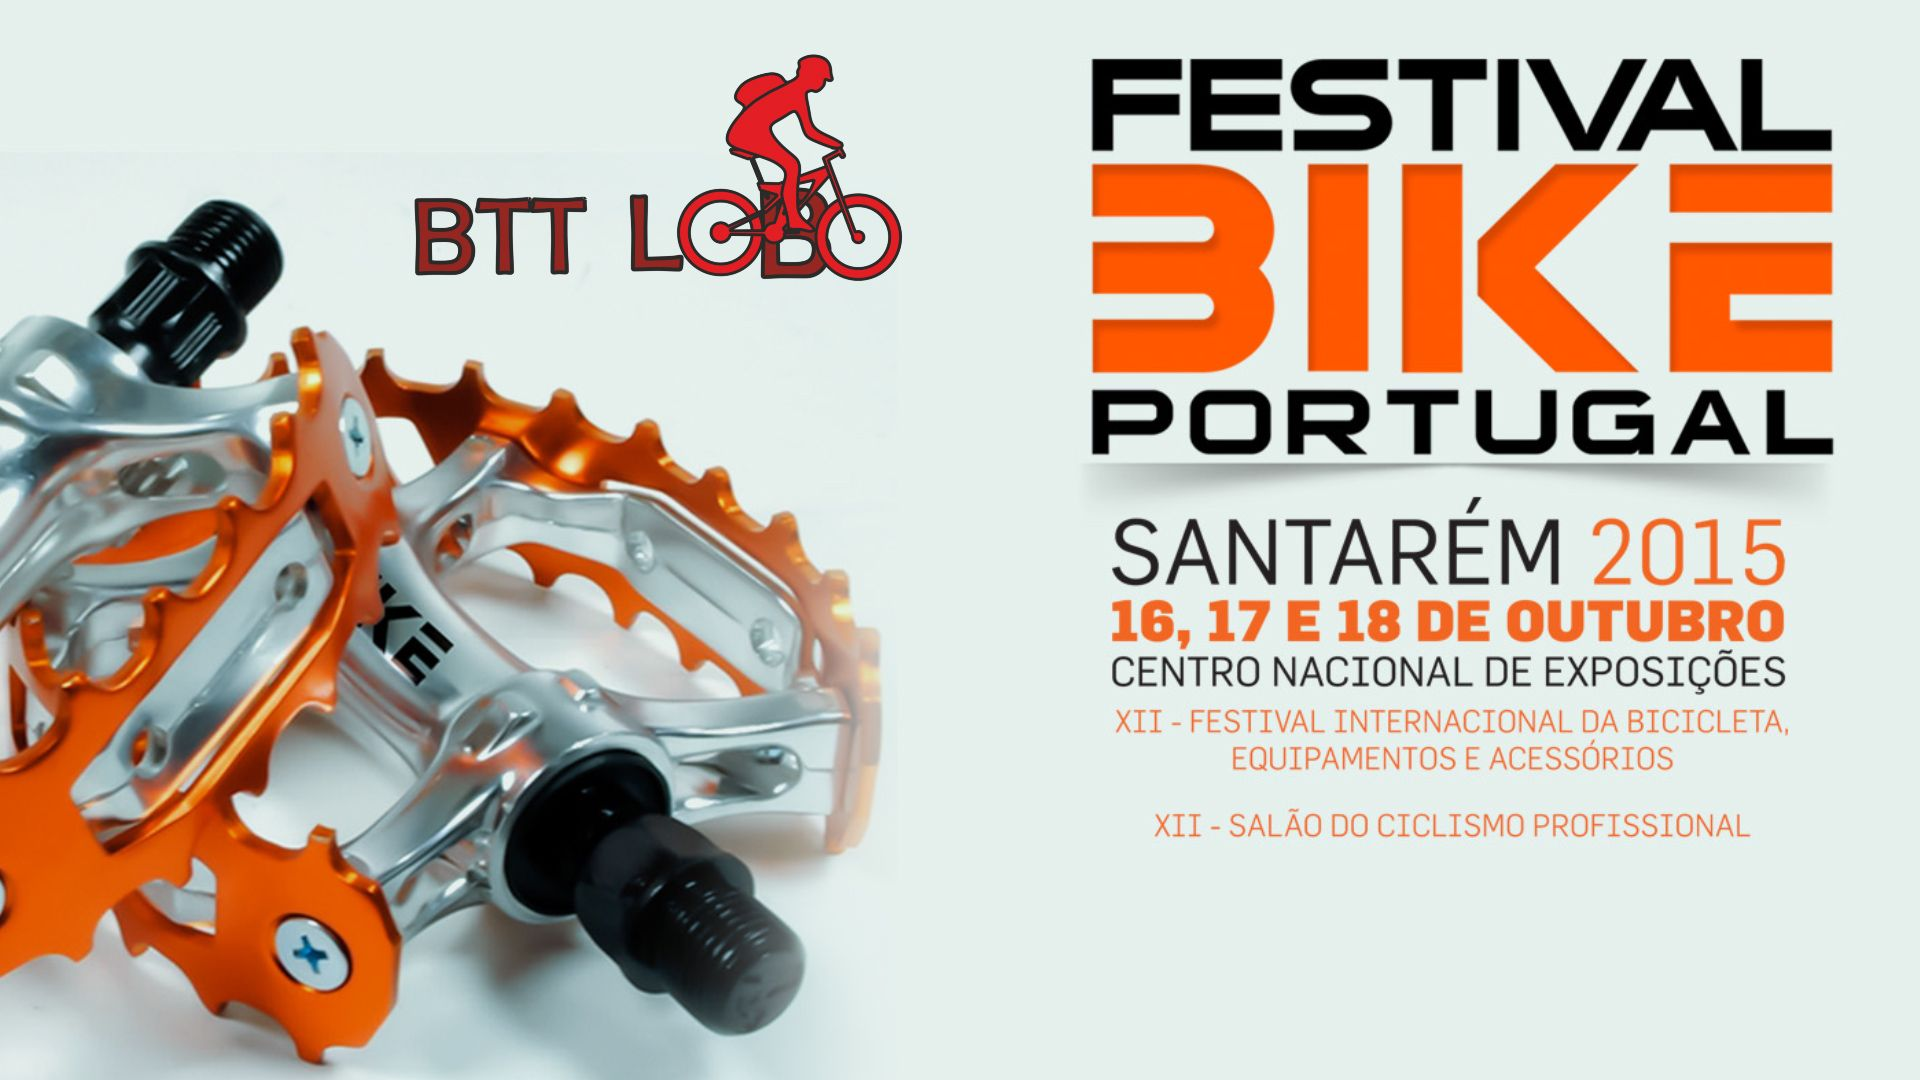 Video | Festival Bike Portugal 2015